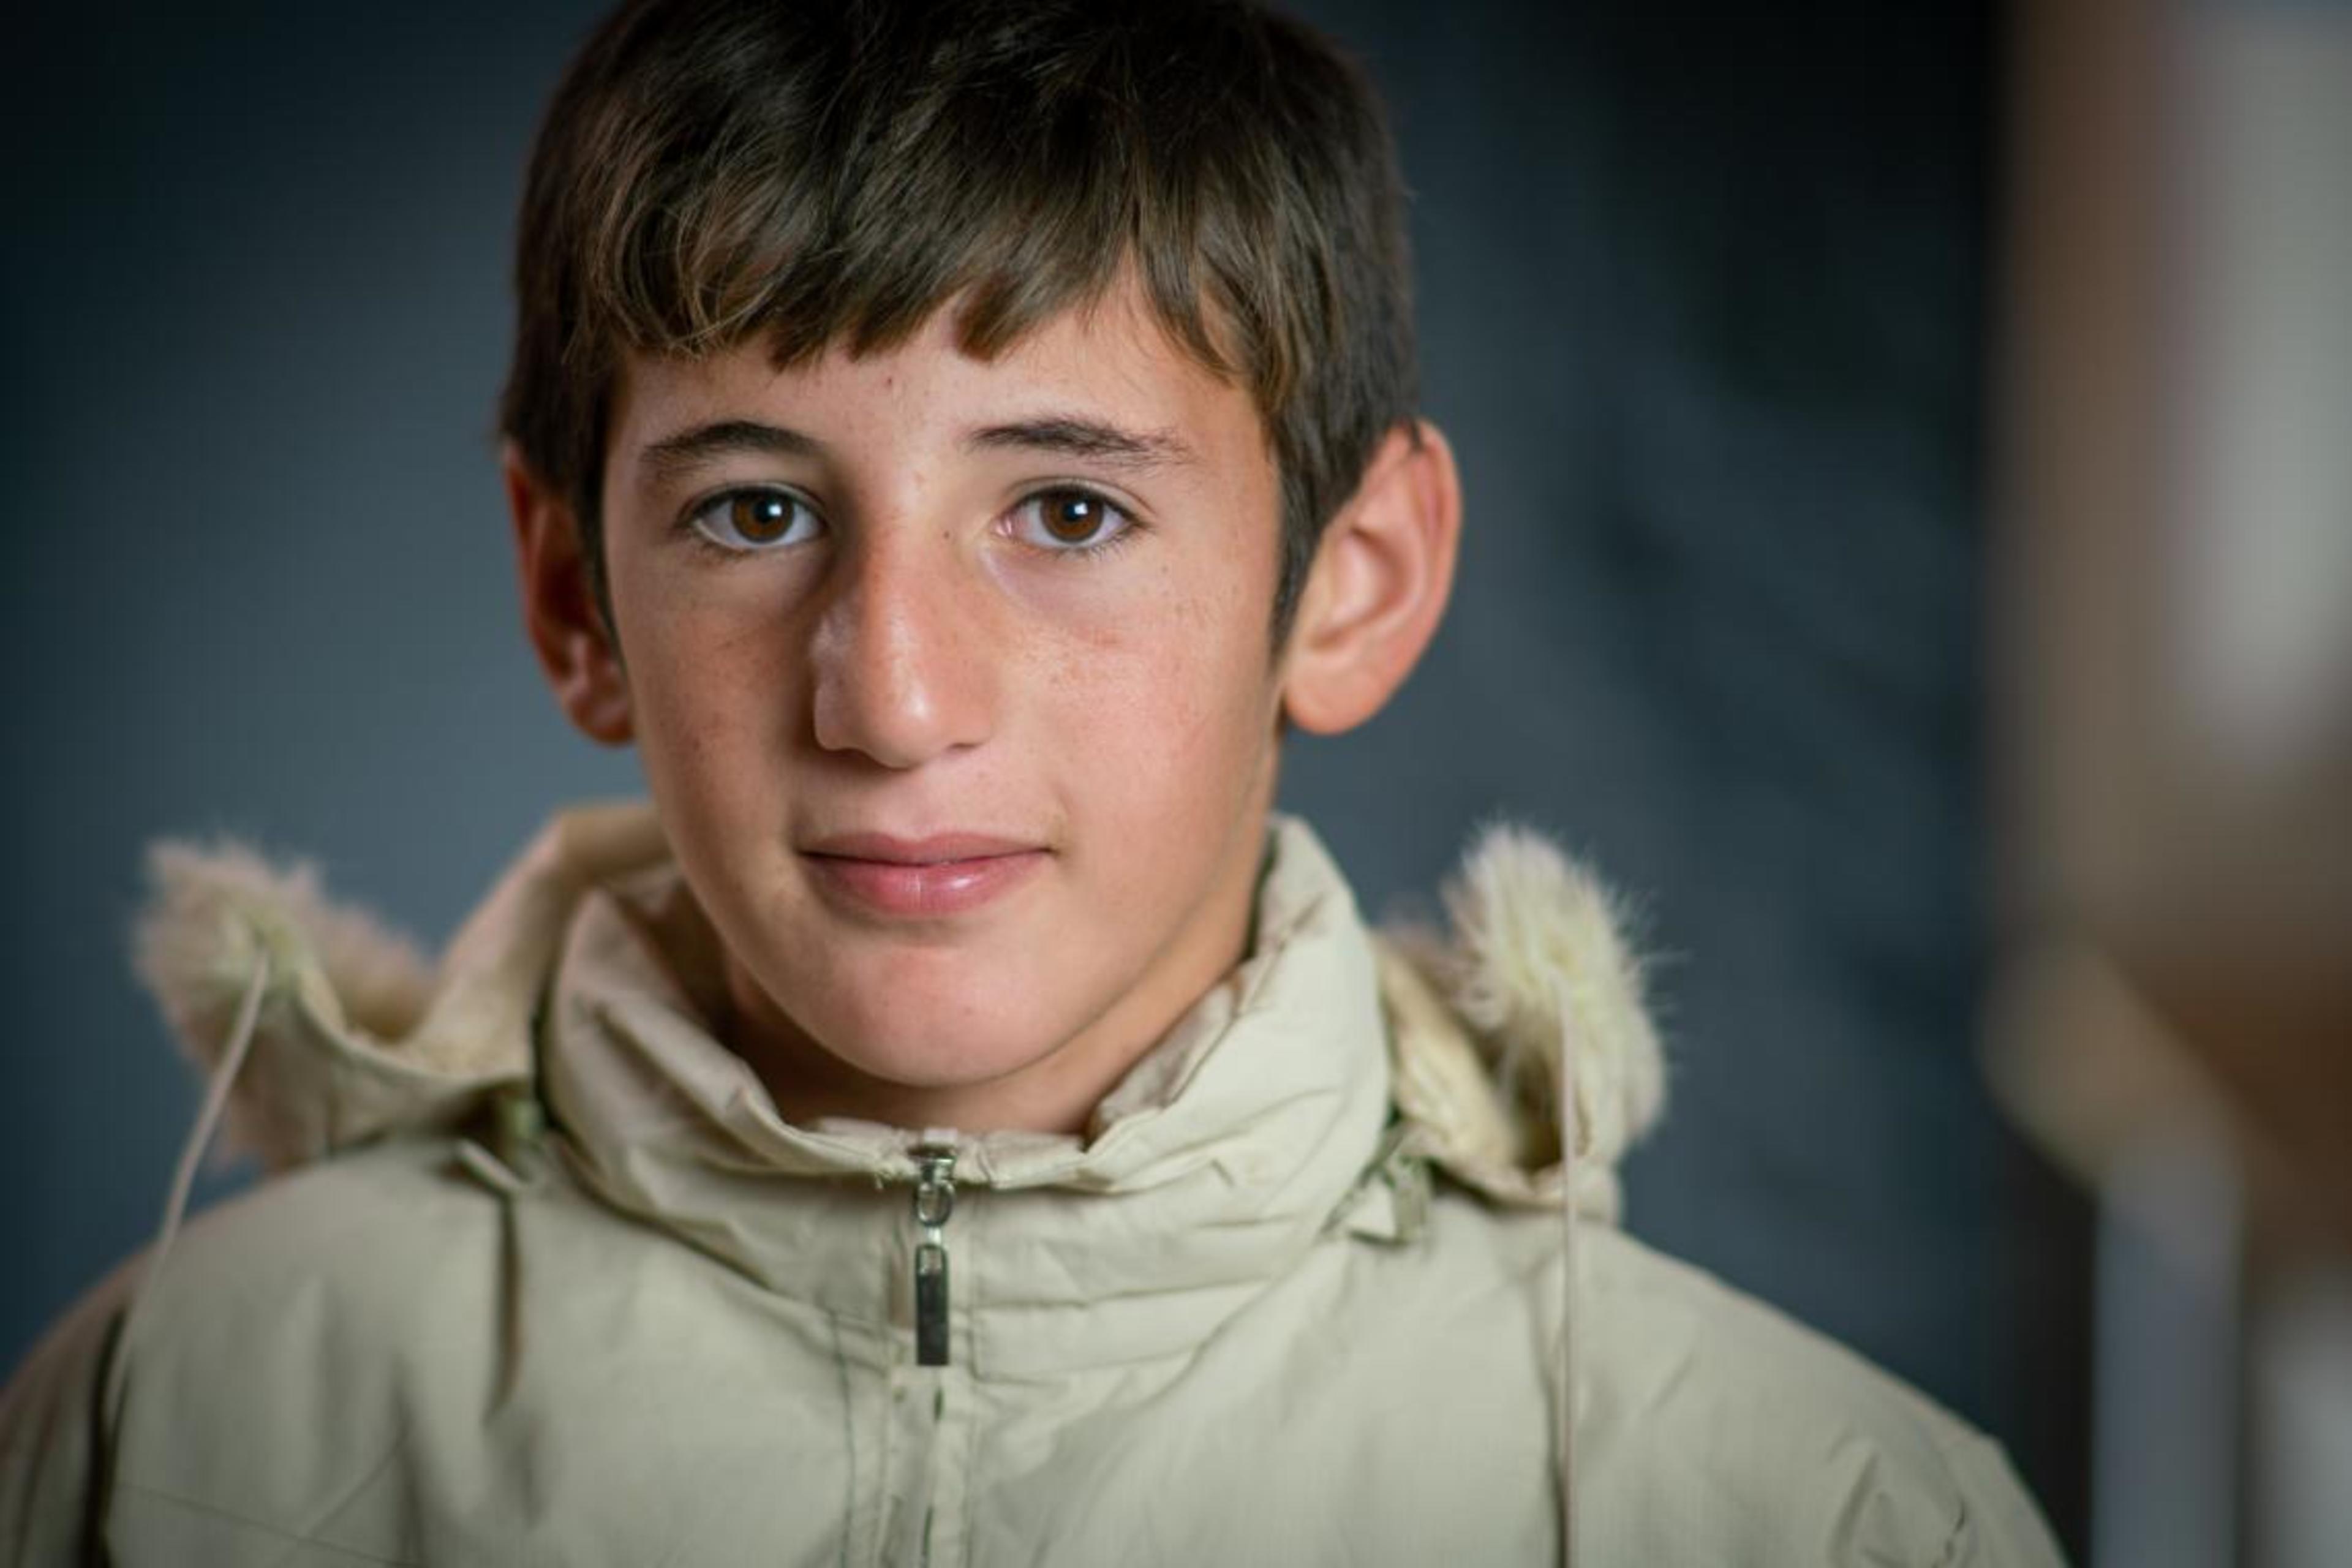 UNICEF/UN0264924/Herwig